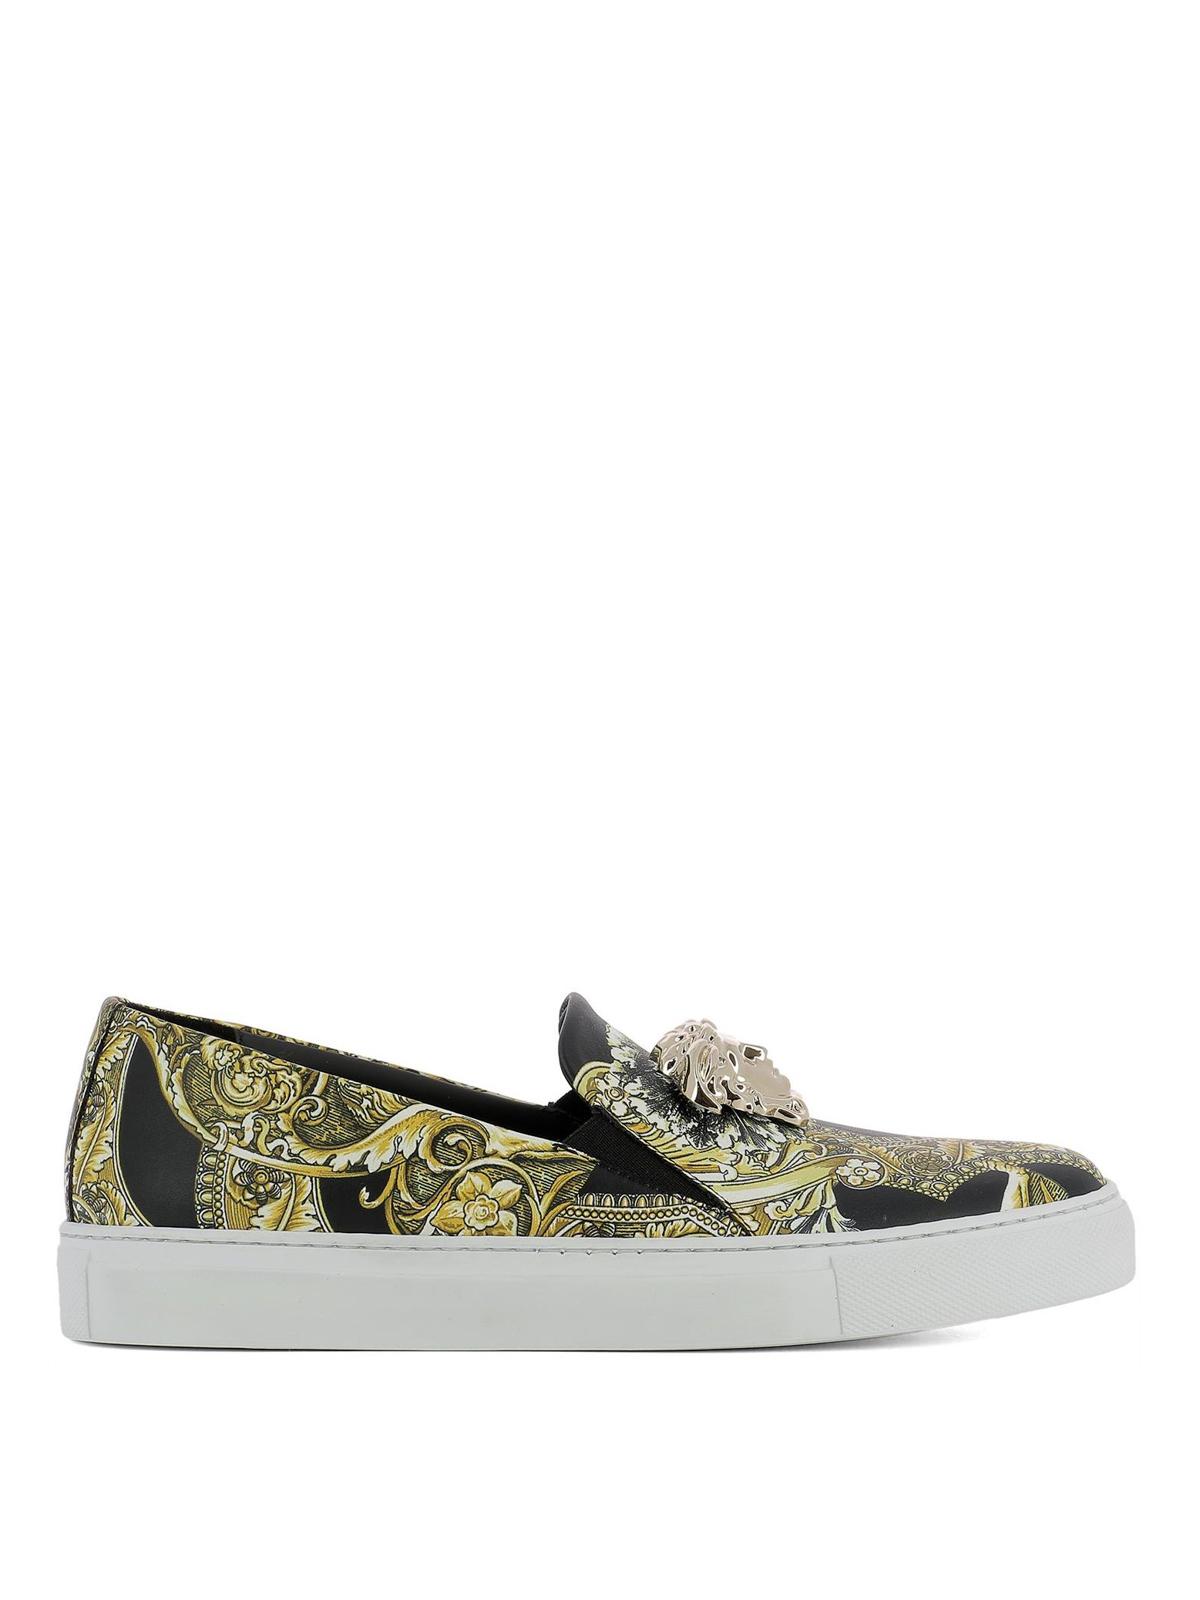 Chaussures Bateau amp; Versace Slipper Multicolore Mocassins HxwqcIxfSF